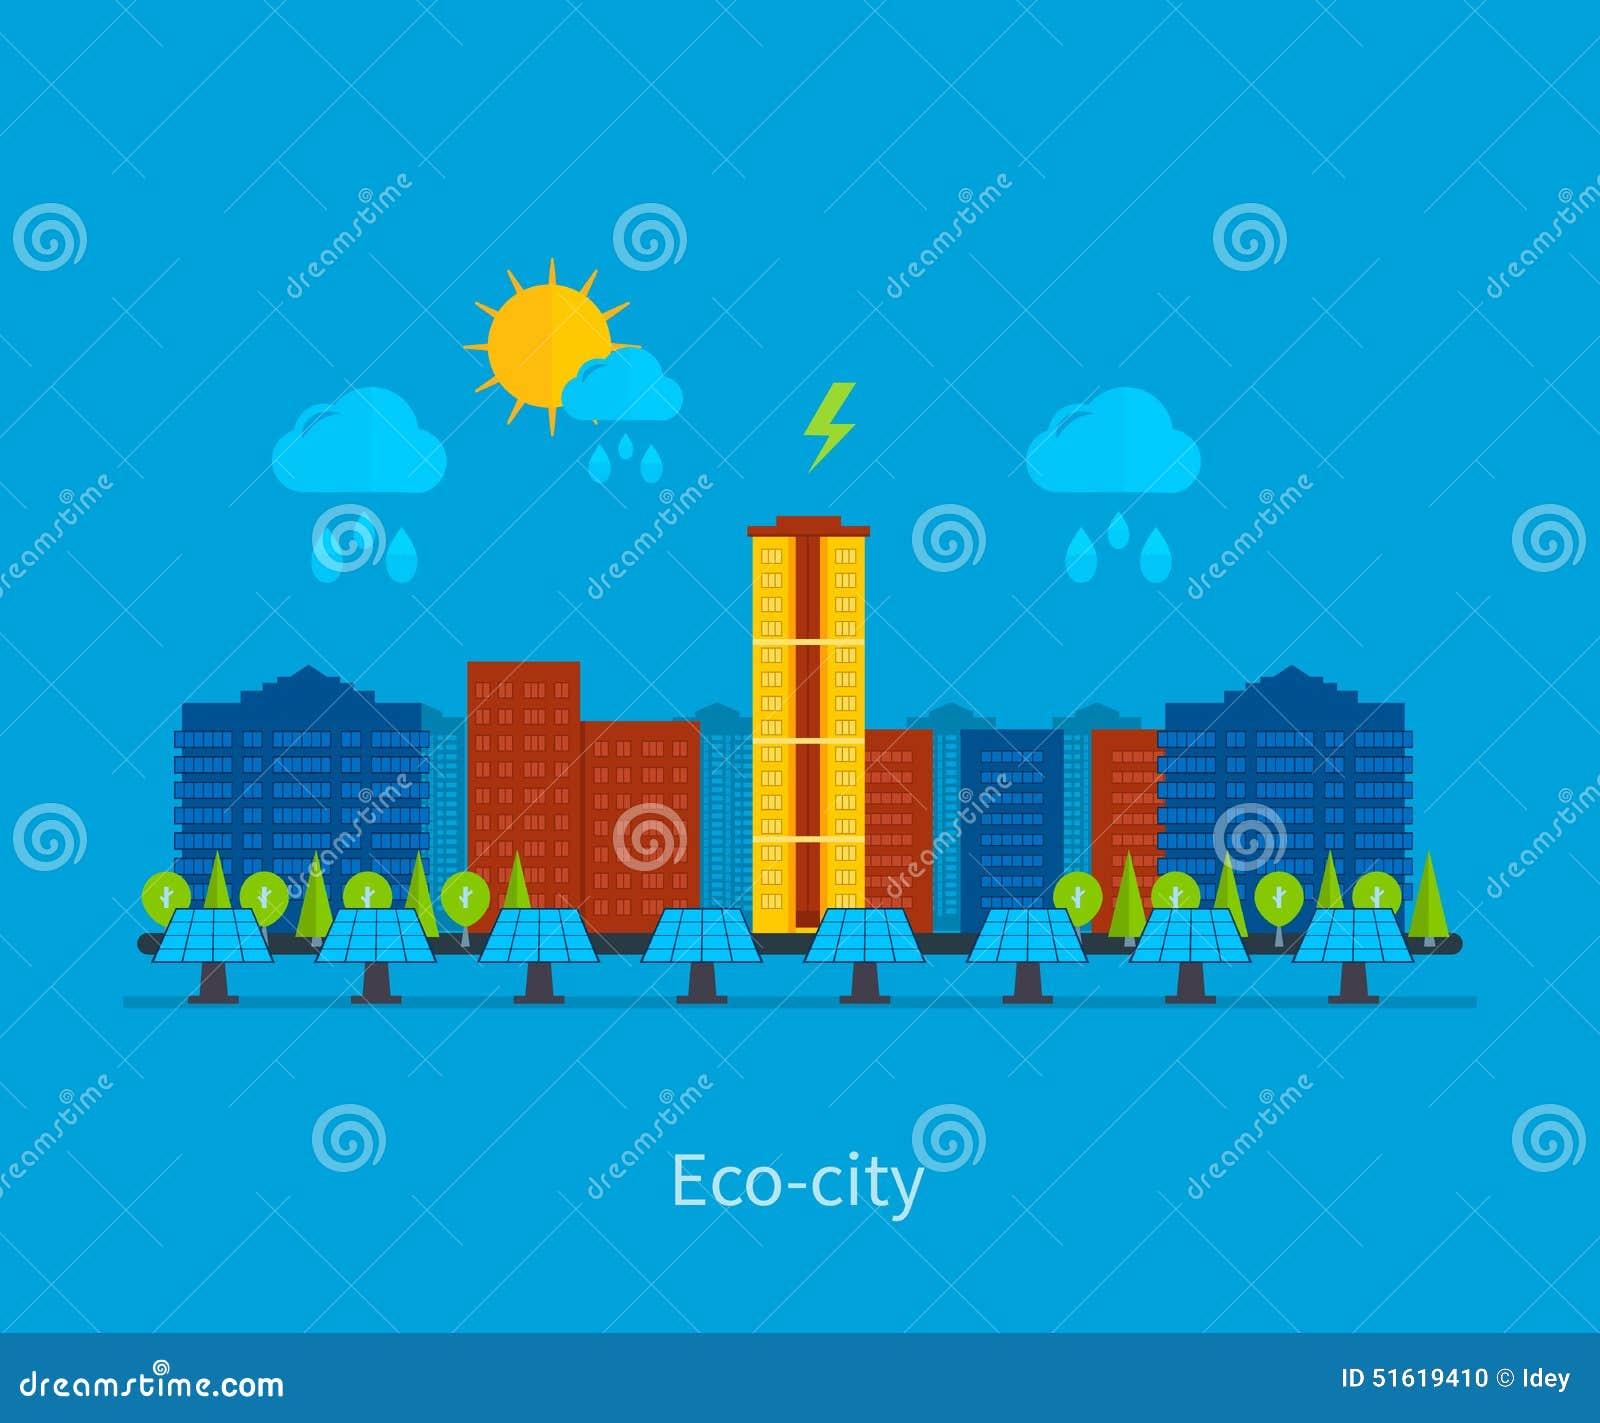 Environmental Concept Earthfriendly Landscapes: City Landscape. Environmentally Friendly House Stock